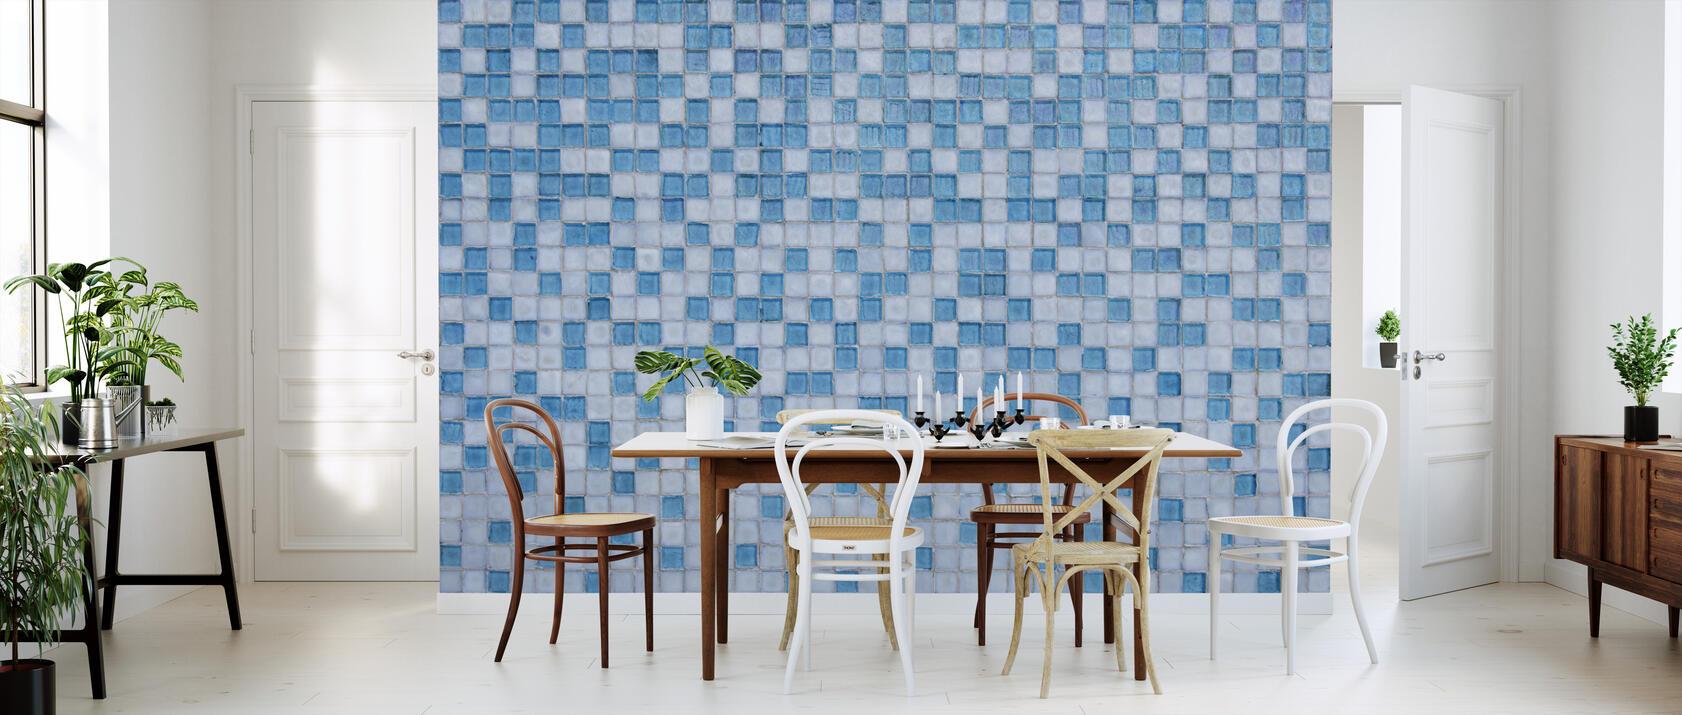 miami mosaic eine fototapete f r jeden raum photowall. Black Bedroom Furniture Sets. Home Design Ideas